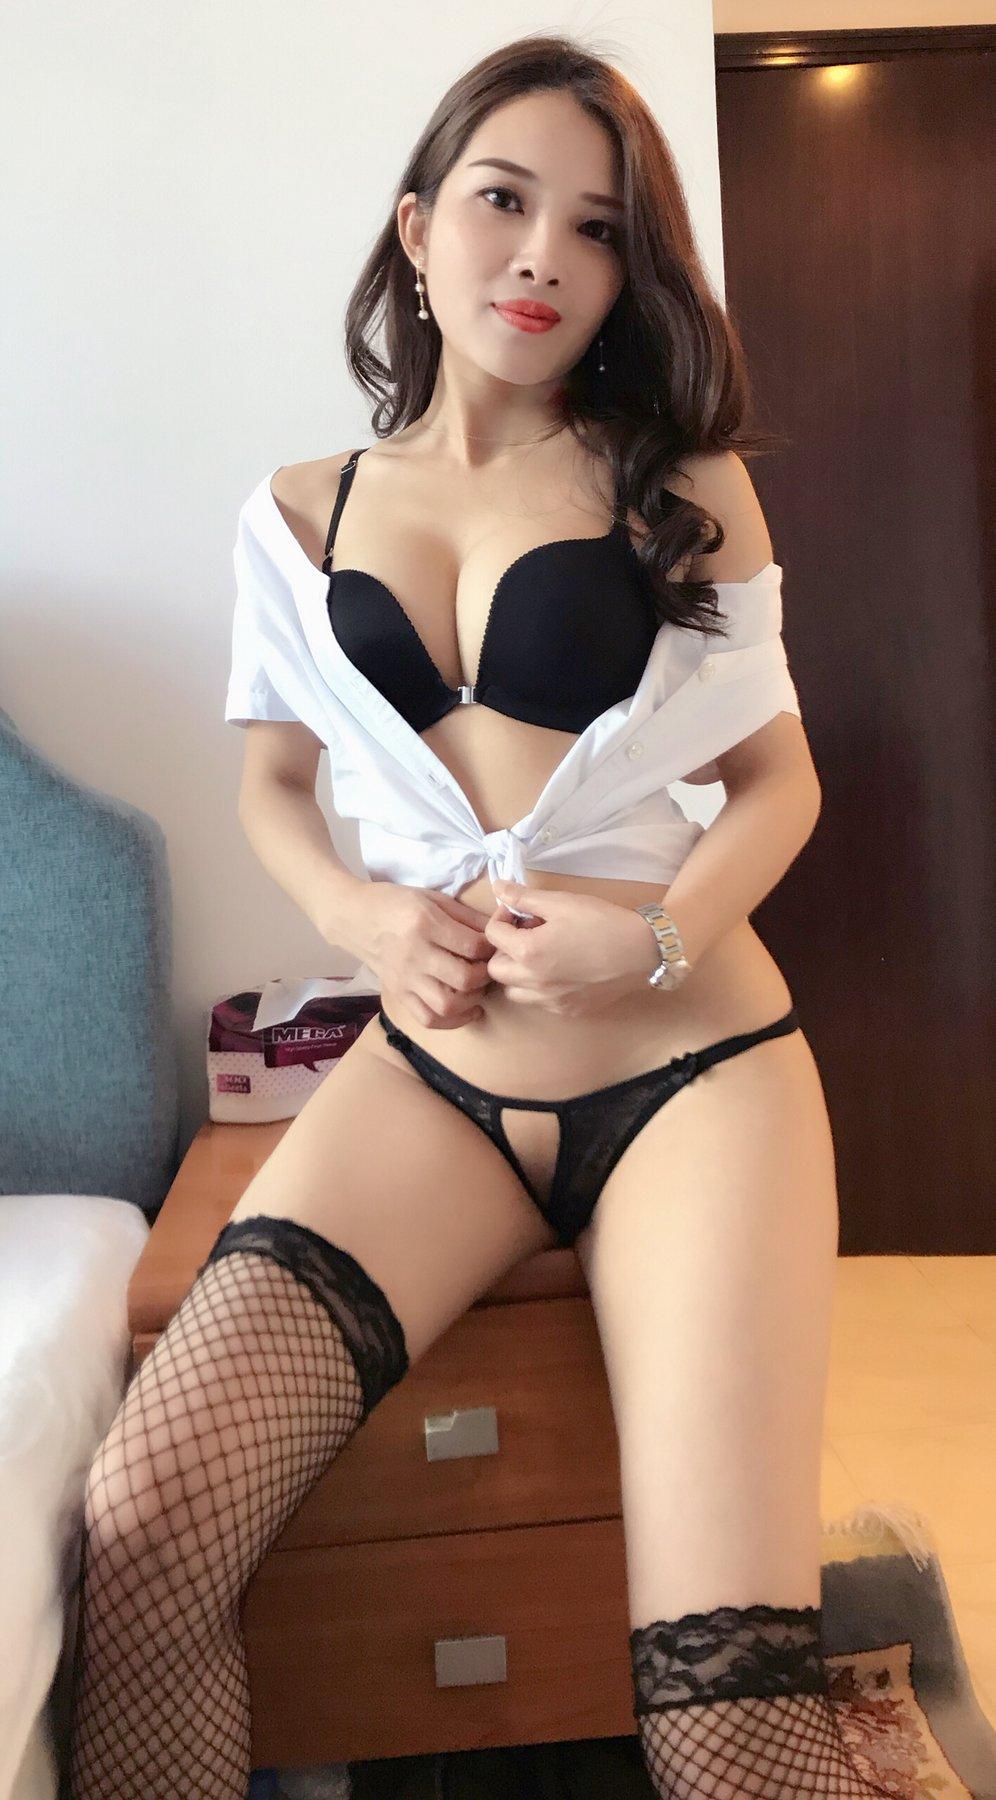 Sexual striptease exotic massage sex videos